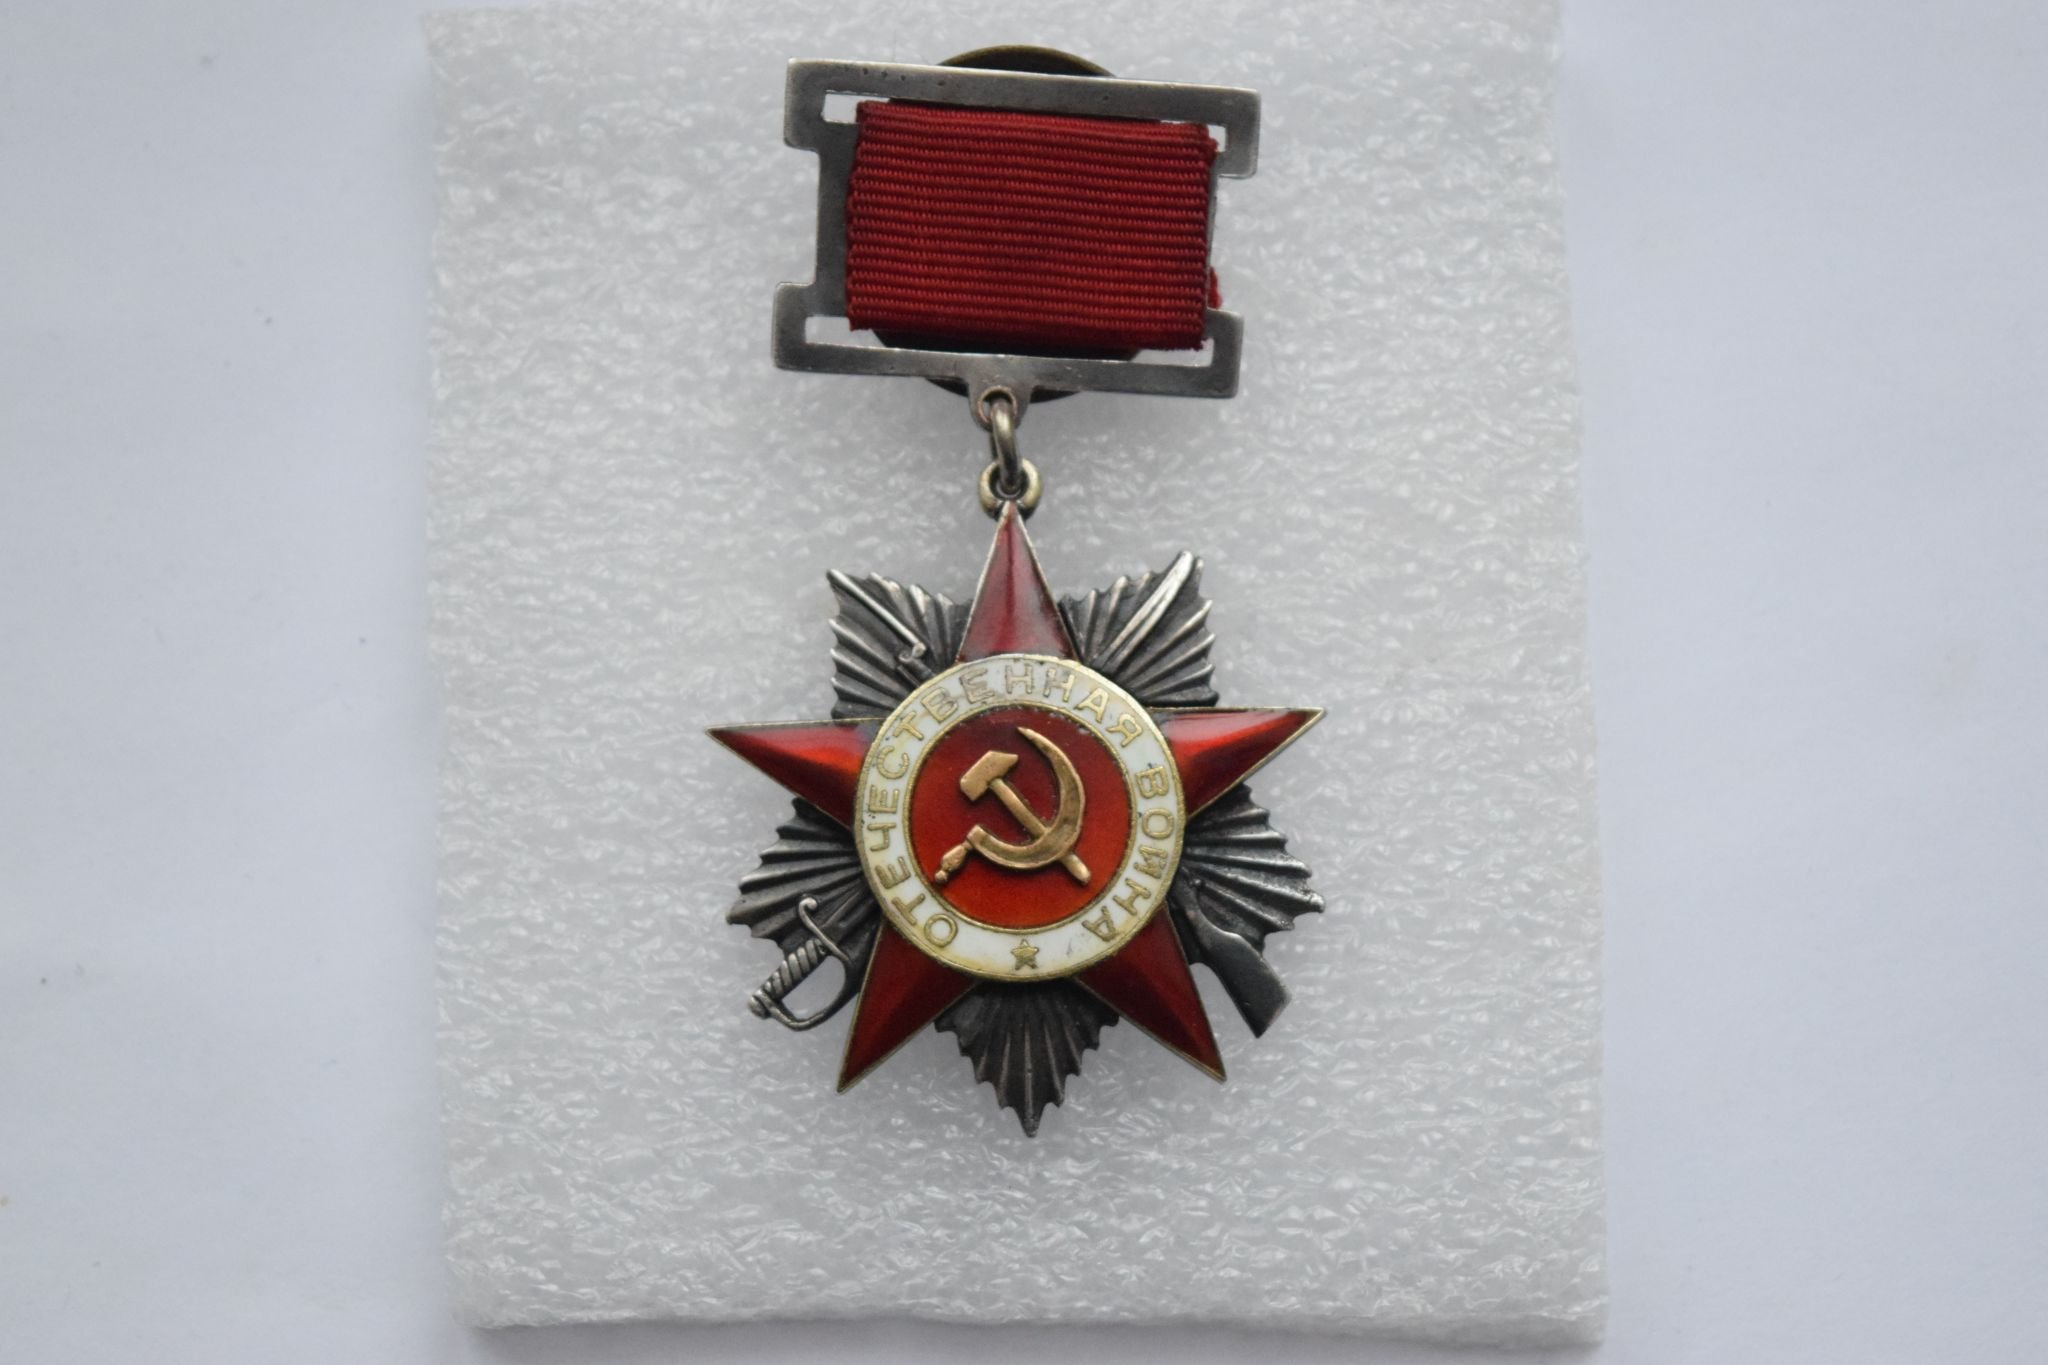 Шельпанов Михаил Александрович Ю 75309410